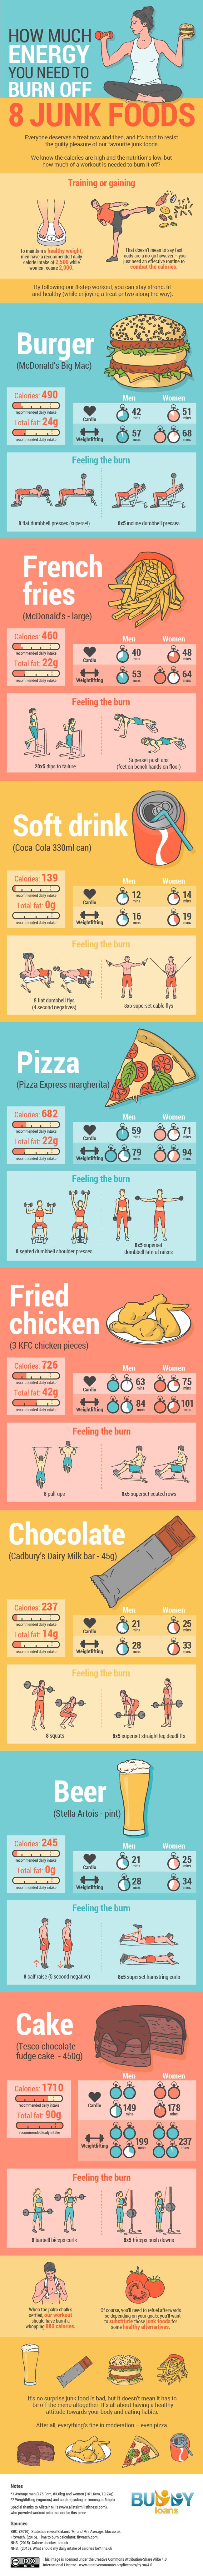 Junk Food Calories